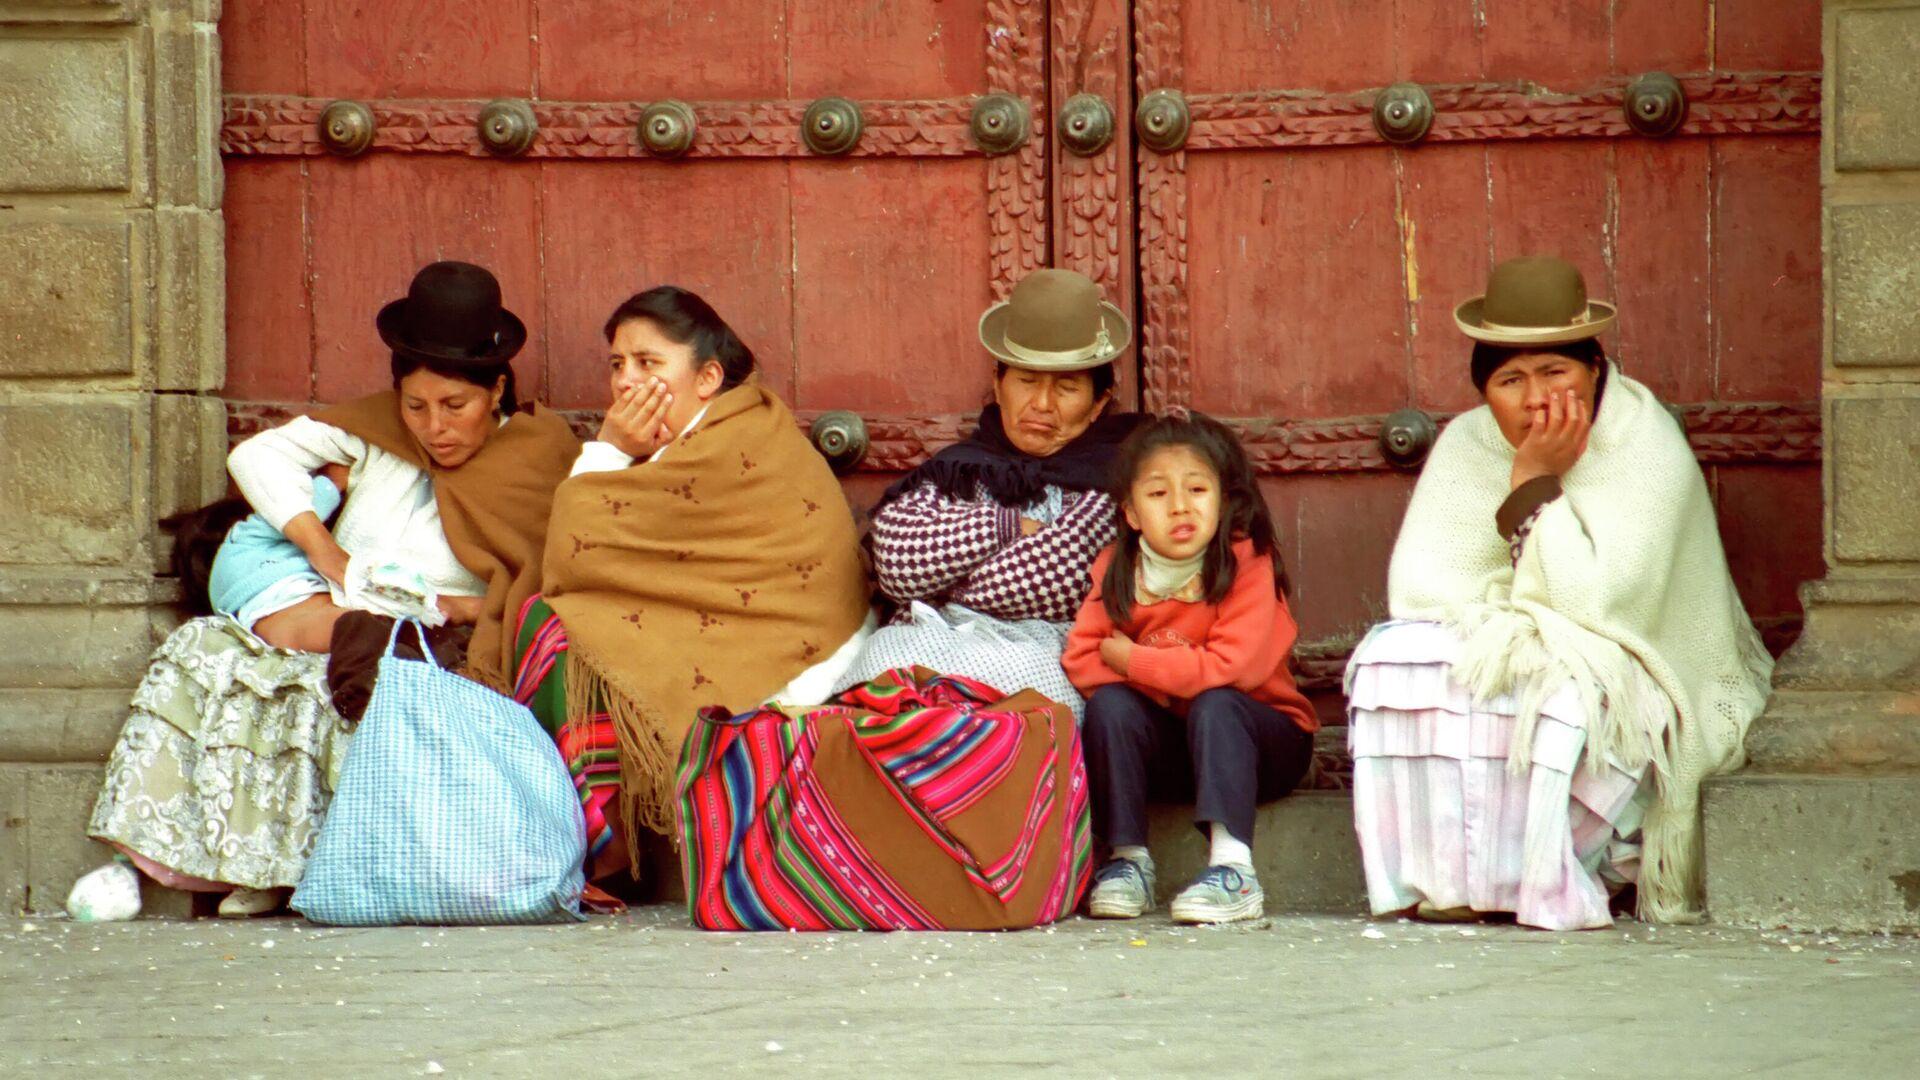 Mujeres con vestimenta tradicional en La Paz - Sputnik Mundo, 1920, 13.07.2021